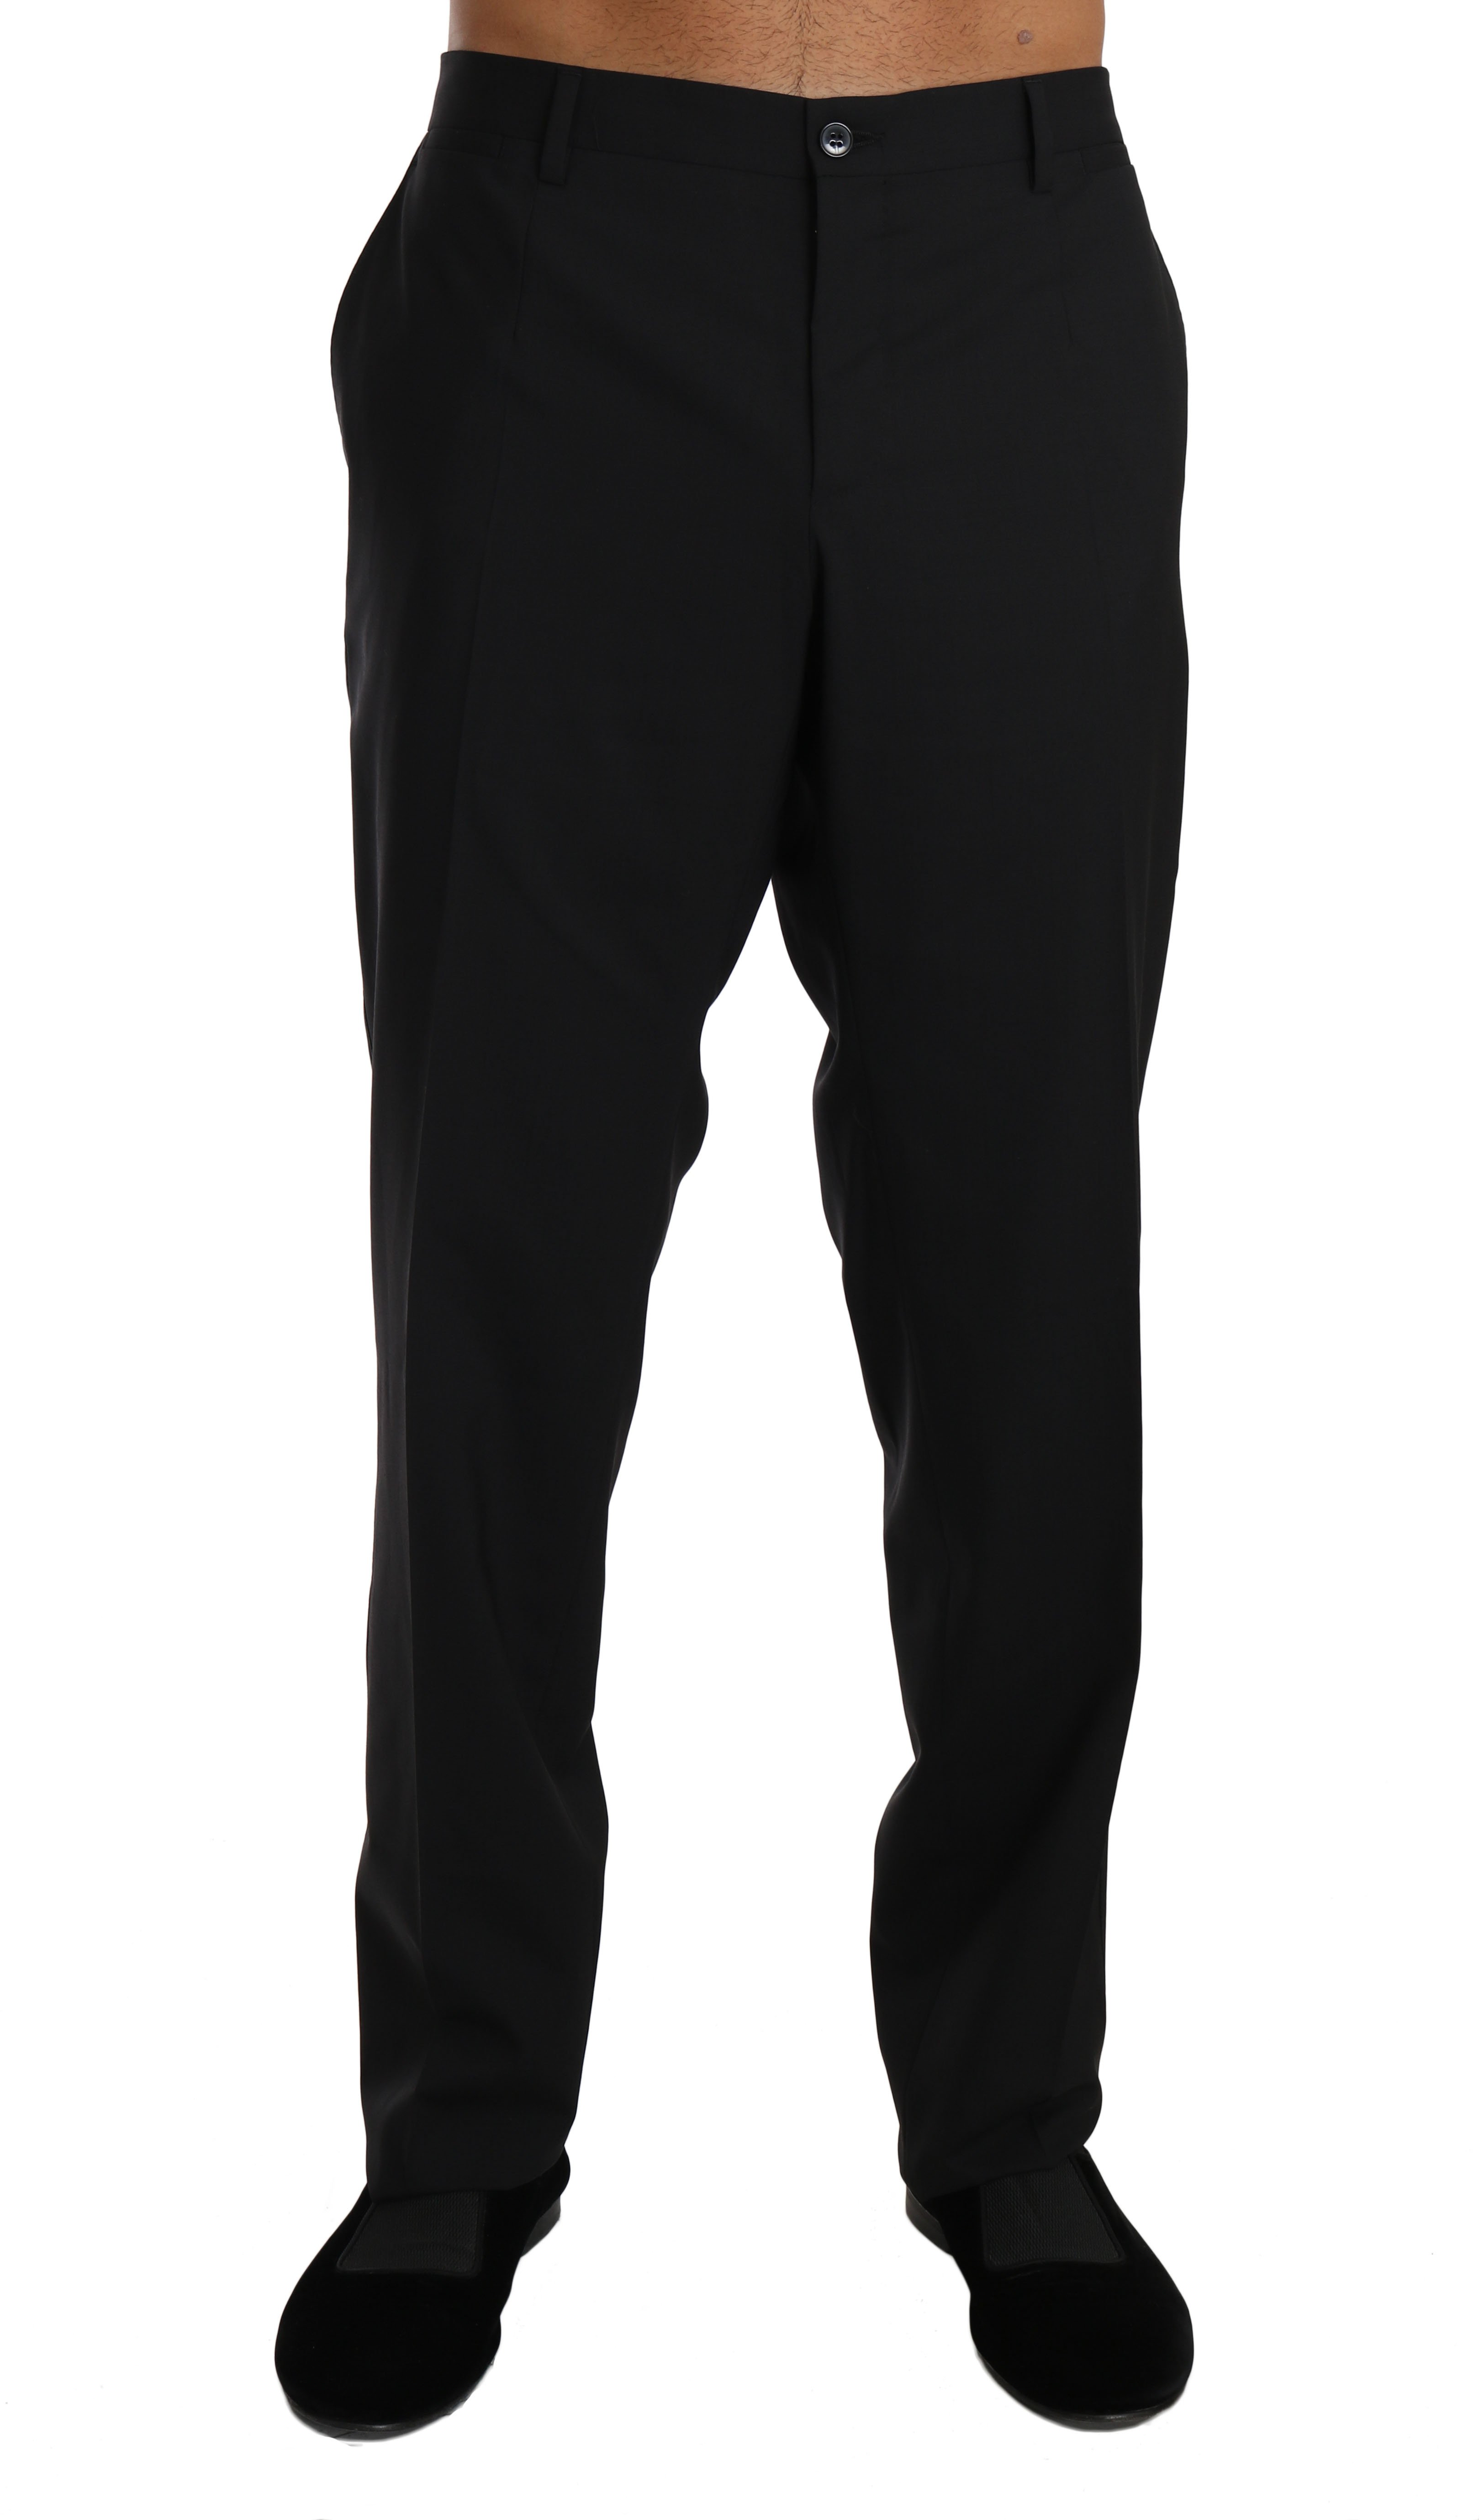 Dolce & Gabbana Men's Cotton Wool Formal Dress Trouser Black BYX1282 - IT54 | XXL